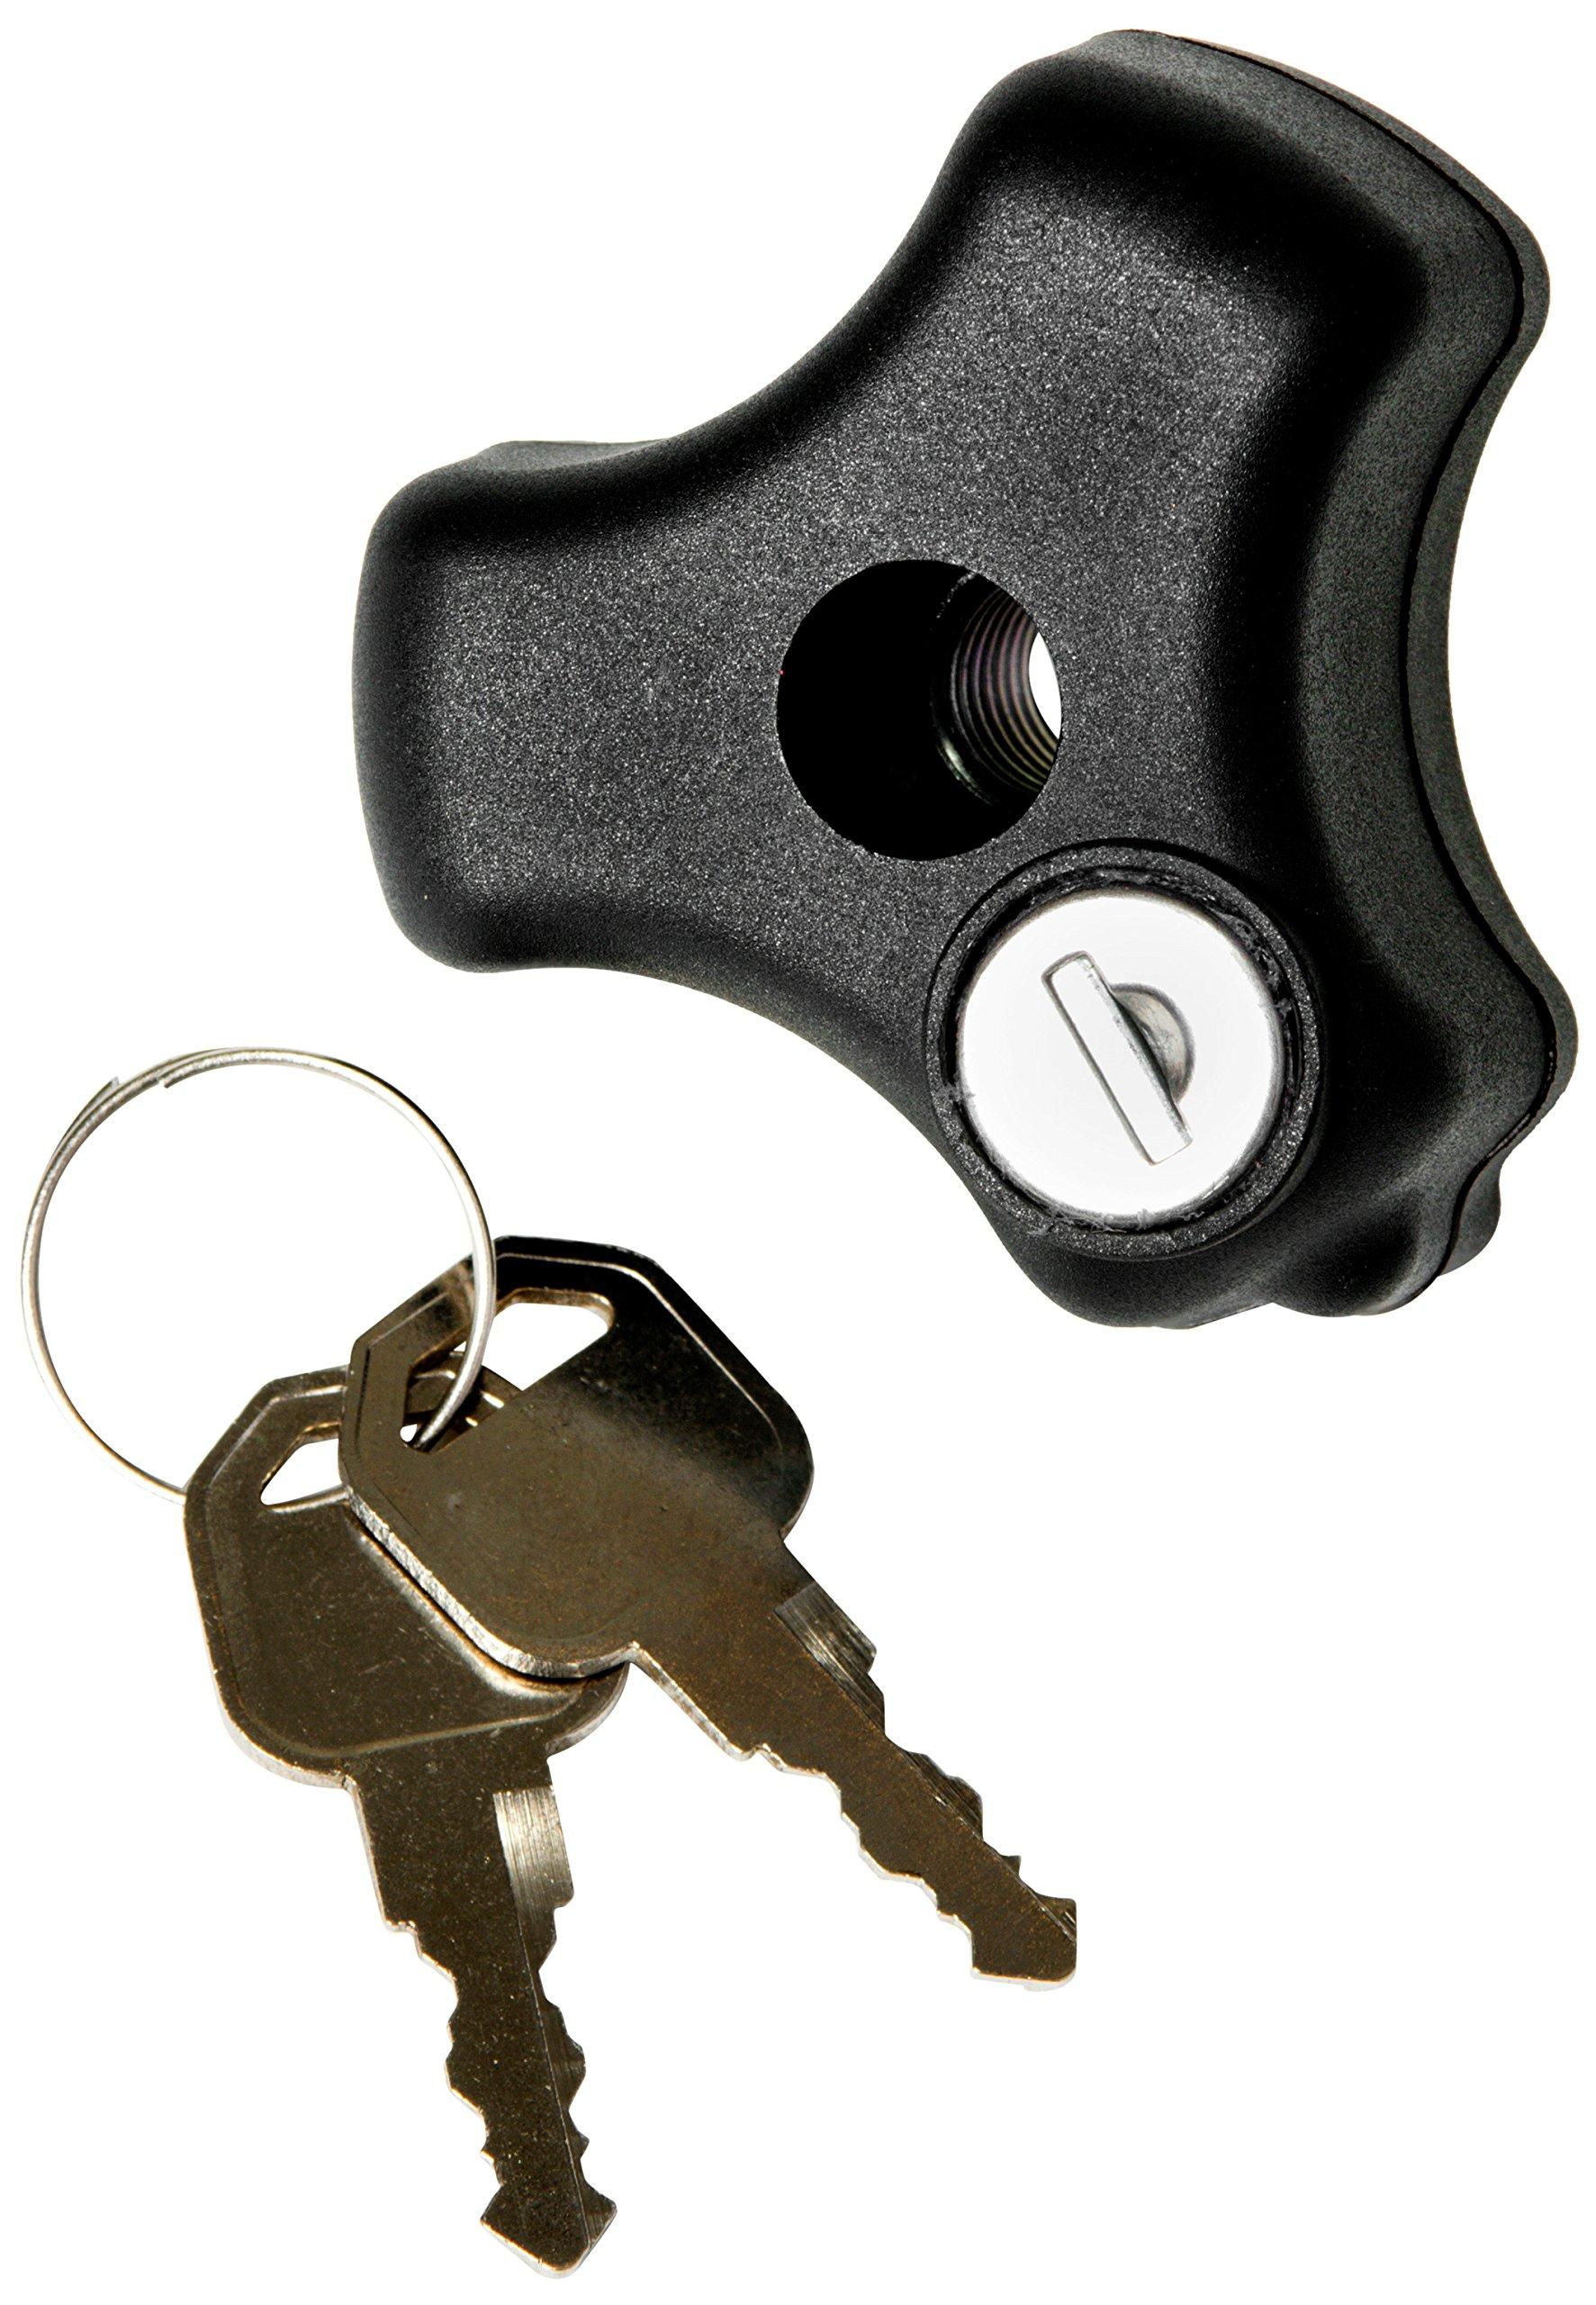 Hi-Lift VERS-LK Versatile Locking Knob by Hi-Lift